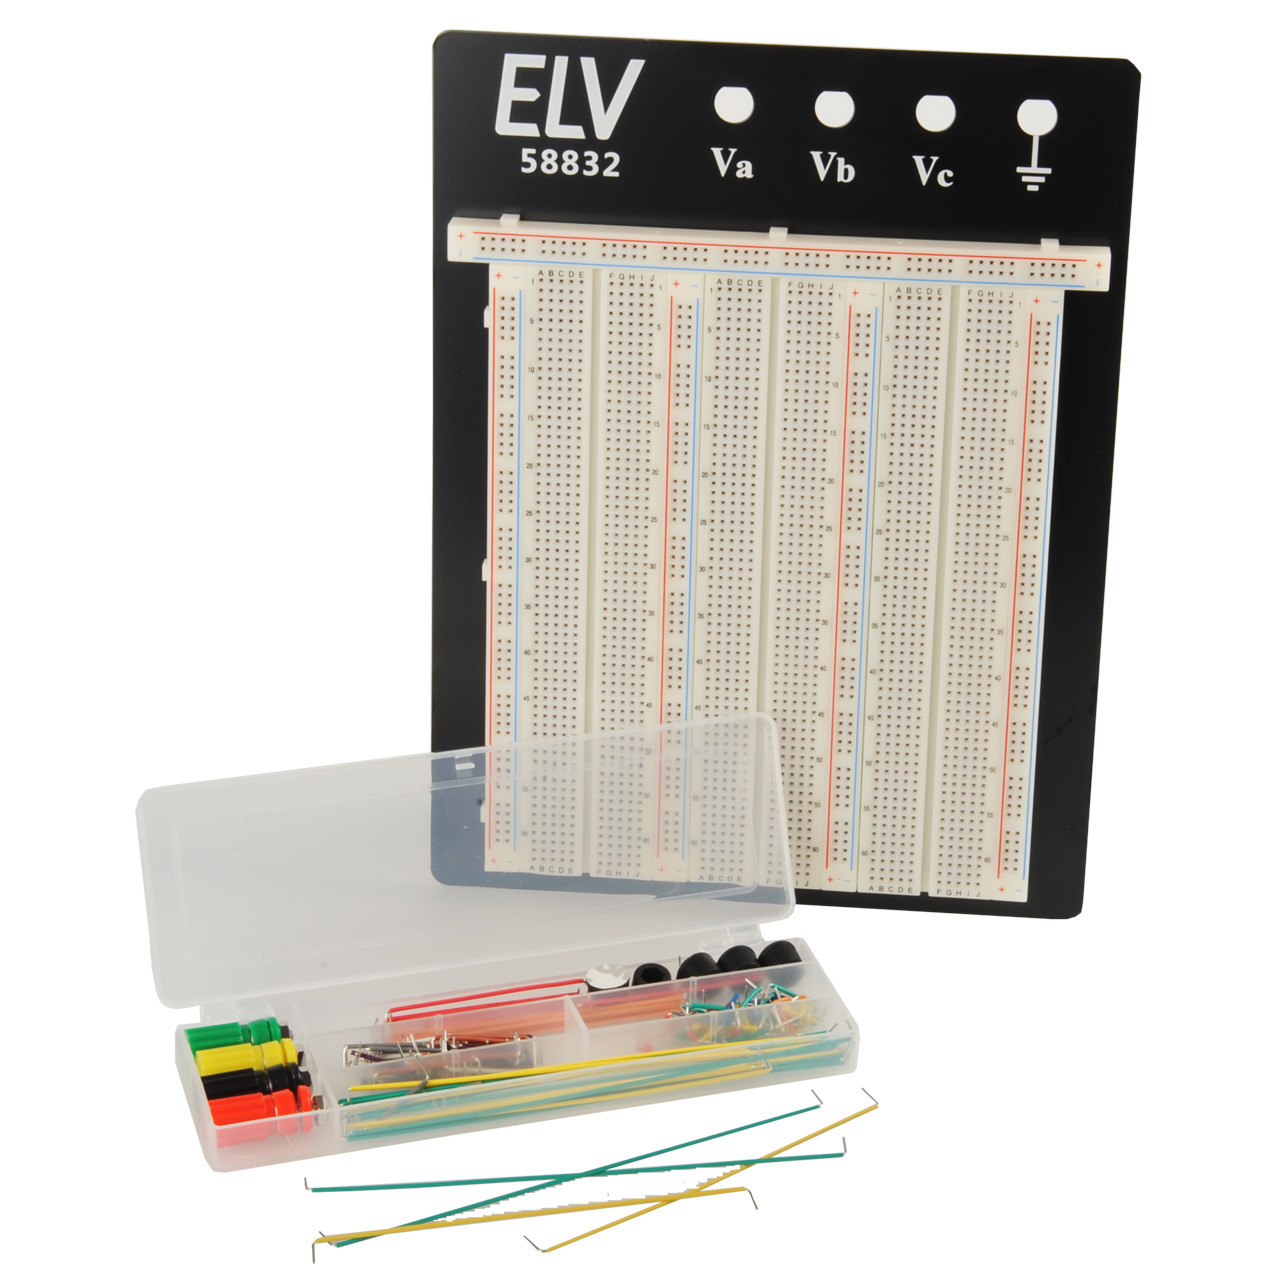 ELV Steckplatine-Breadboard 106 J- 2390 Kontakte- inkl- 140-teiligem Drahtbrücken-Set